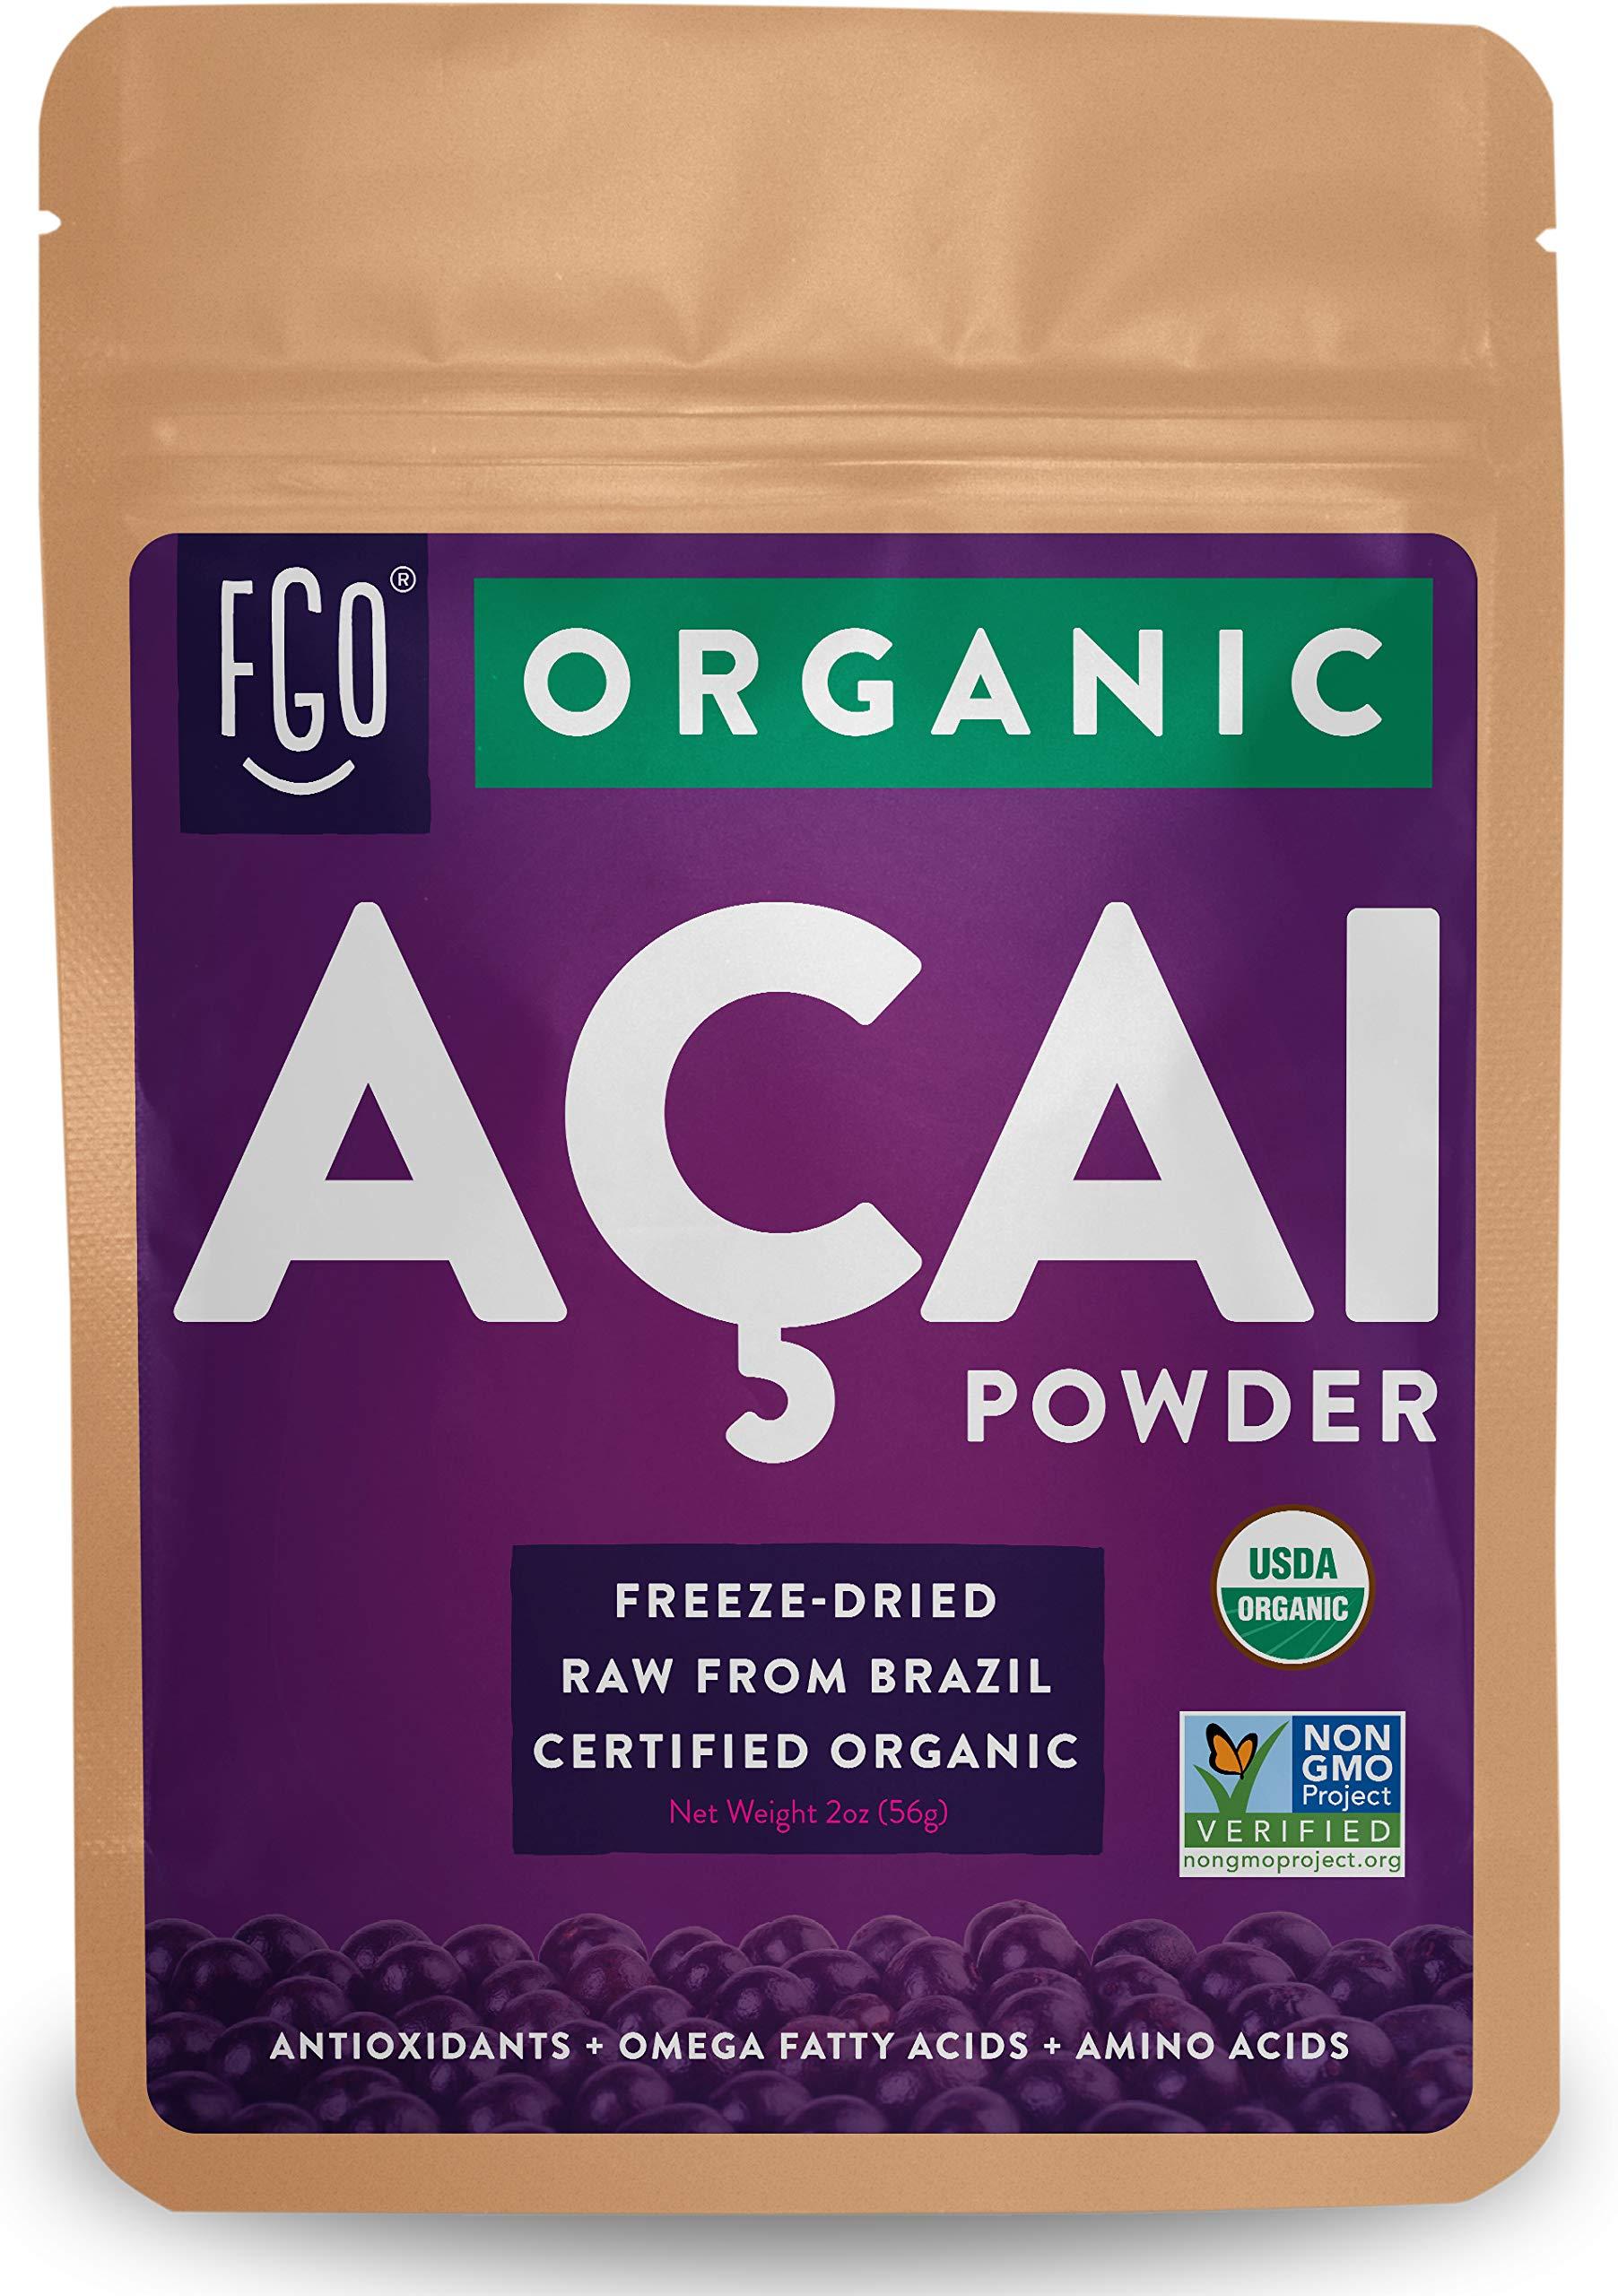 Organic ACAI Powder (Freeze-Dried)   2oz Resealable Kraft Bag   100% Raw Antioxidant Superfood Berry From Brazil   by FGO